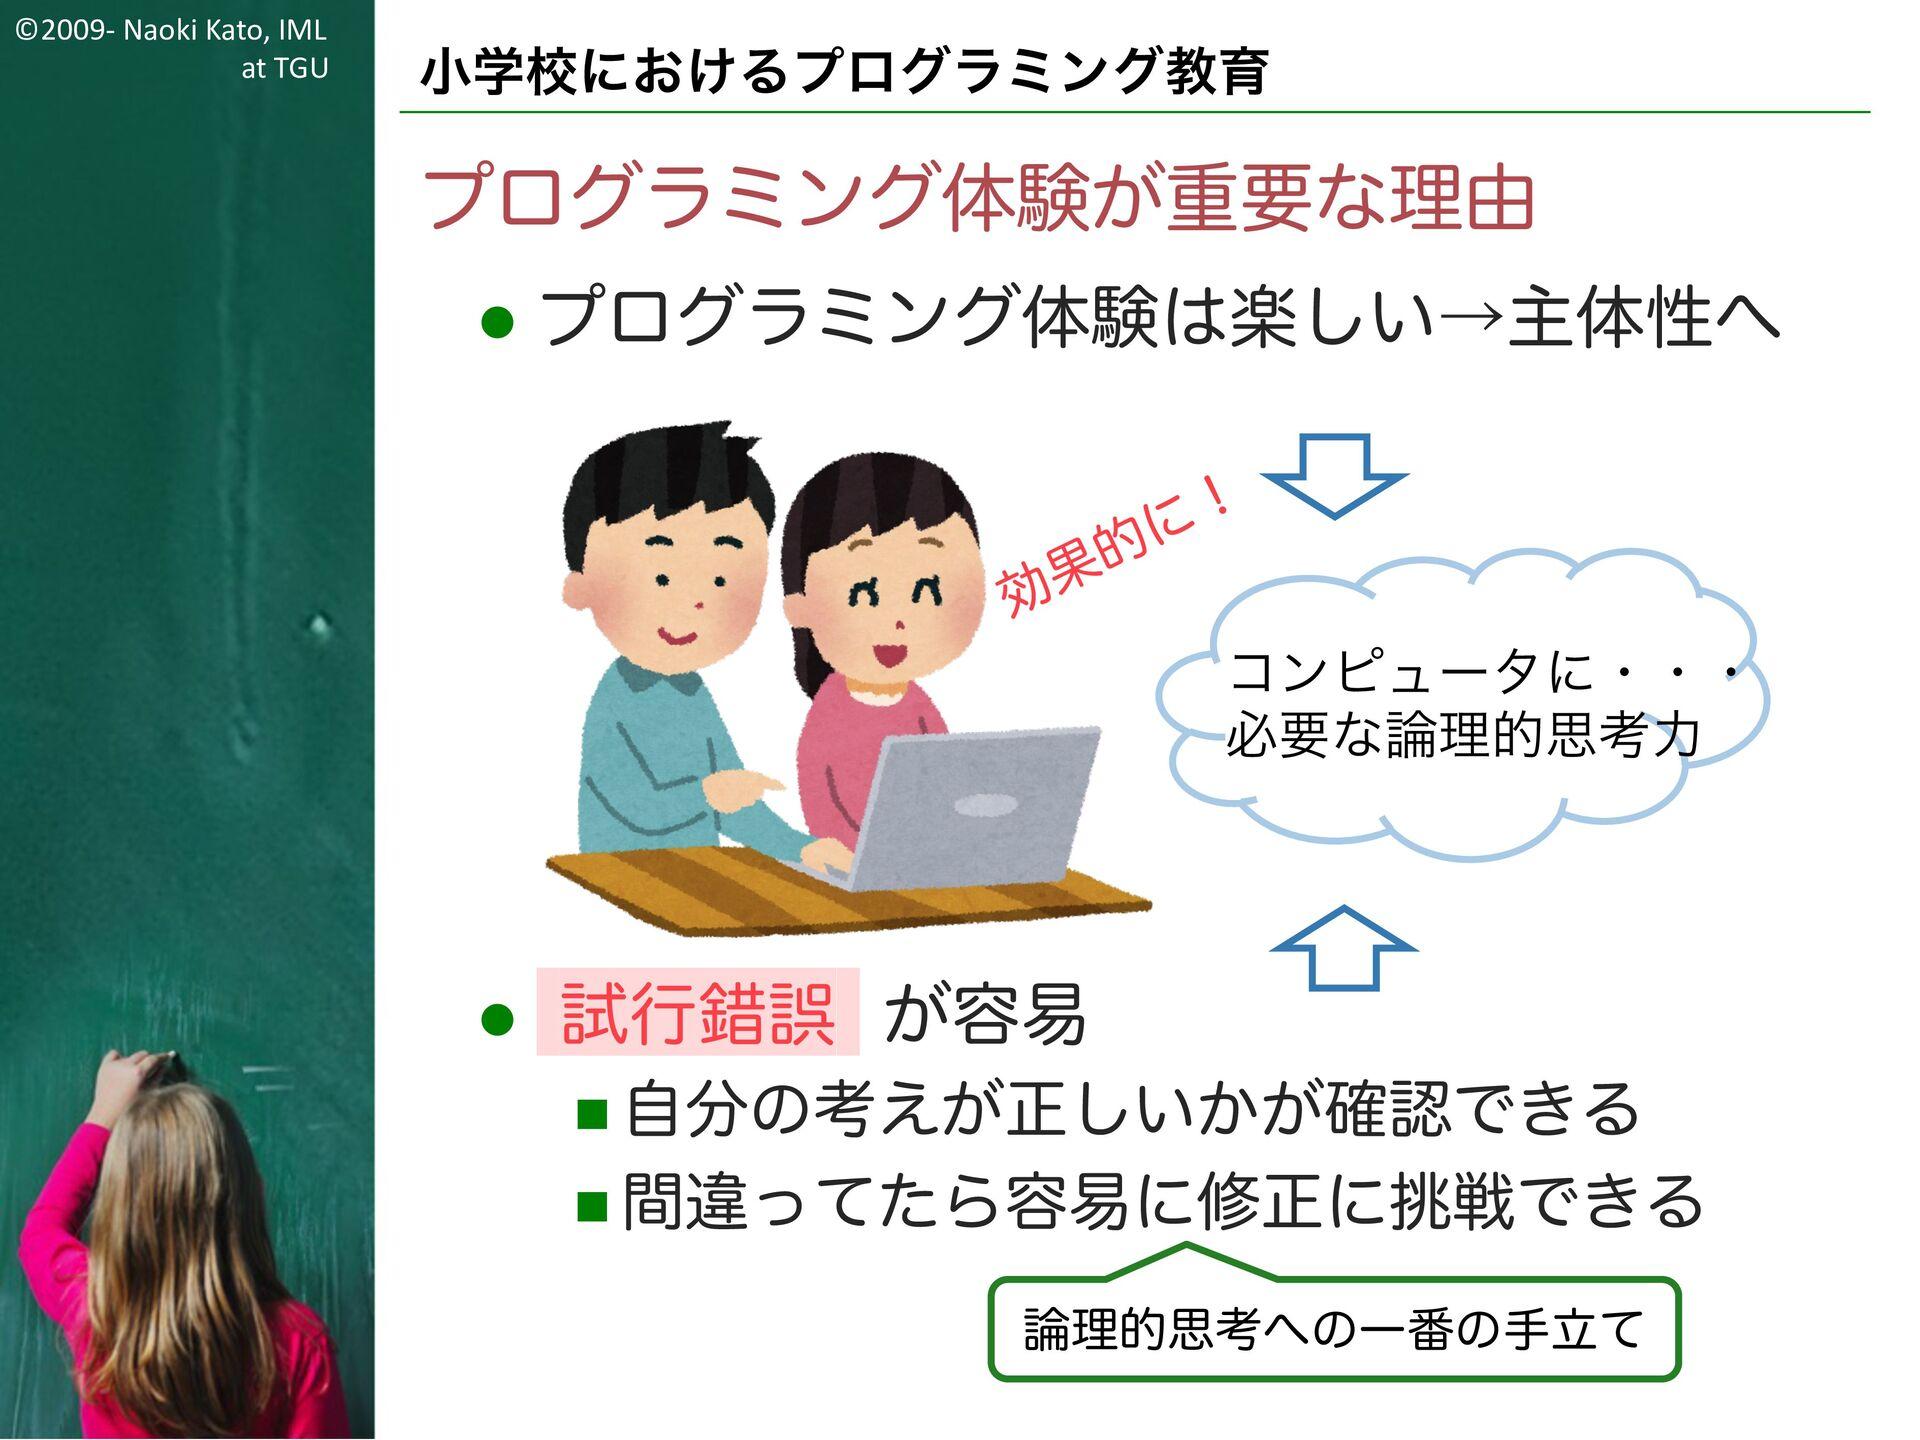 ©2009- Naoki Kato, IML at TGU プログラミング教育の展開